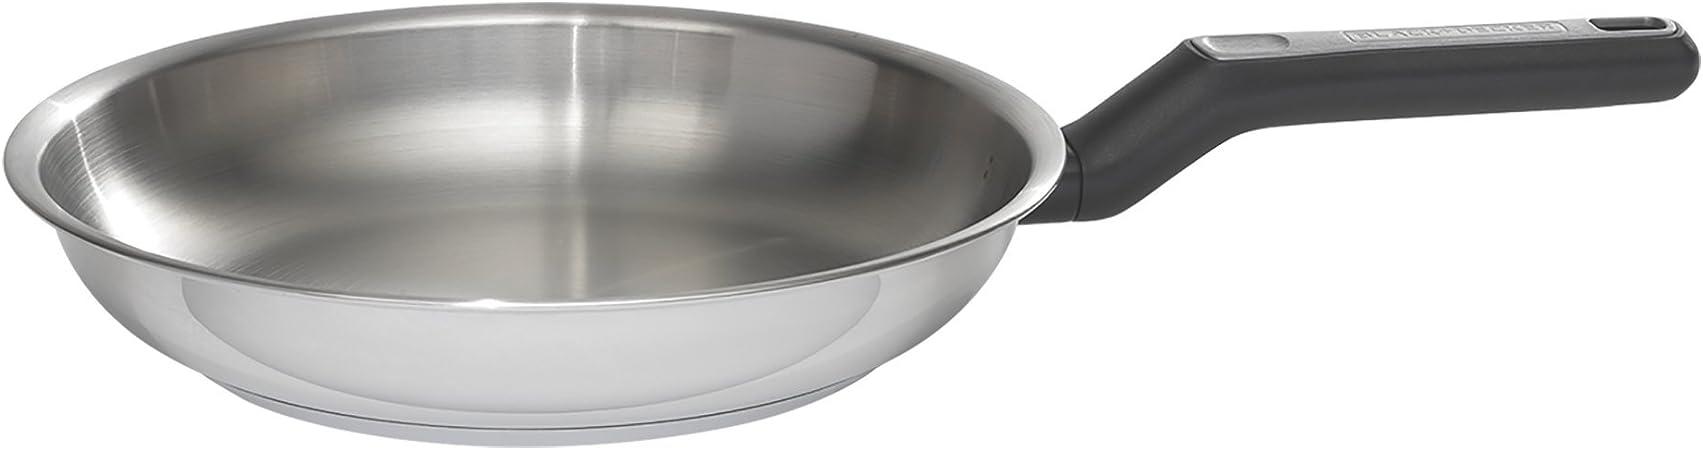 BLACK DECKER 83381 Durable Stainless Steel Fry Pan, 10 , Silver